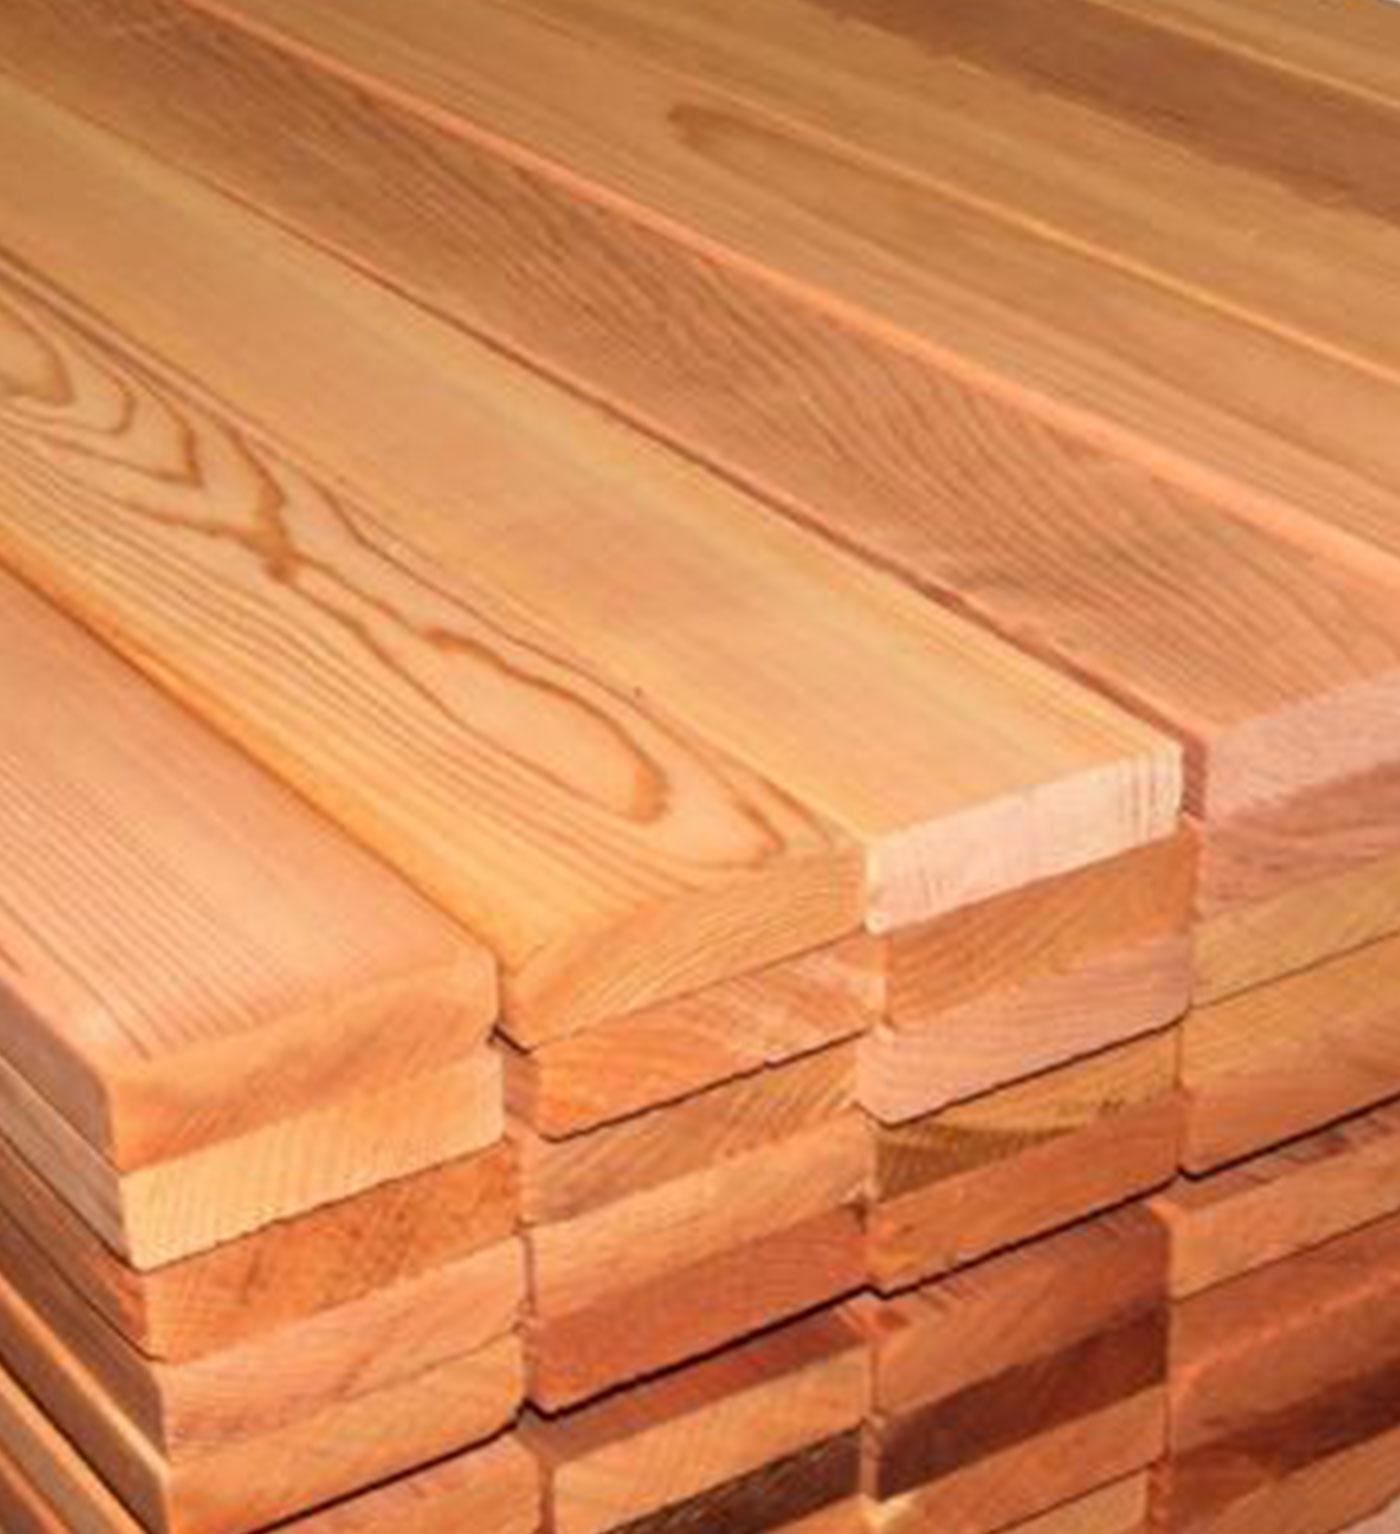 redwood-consistent